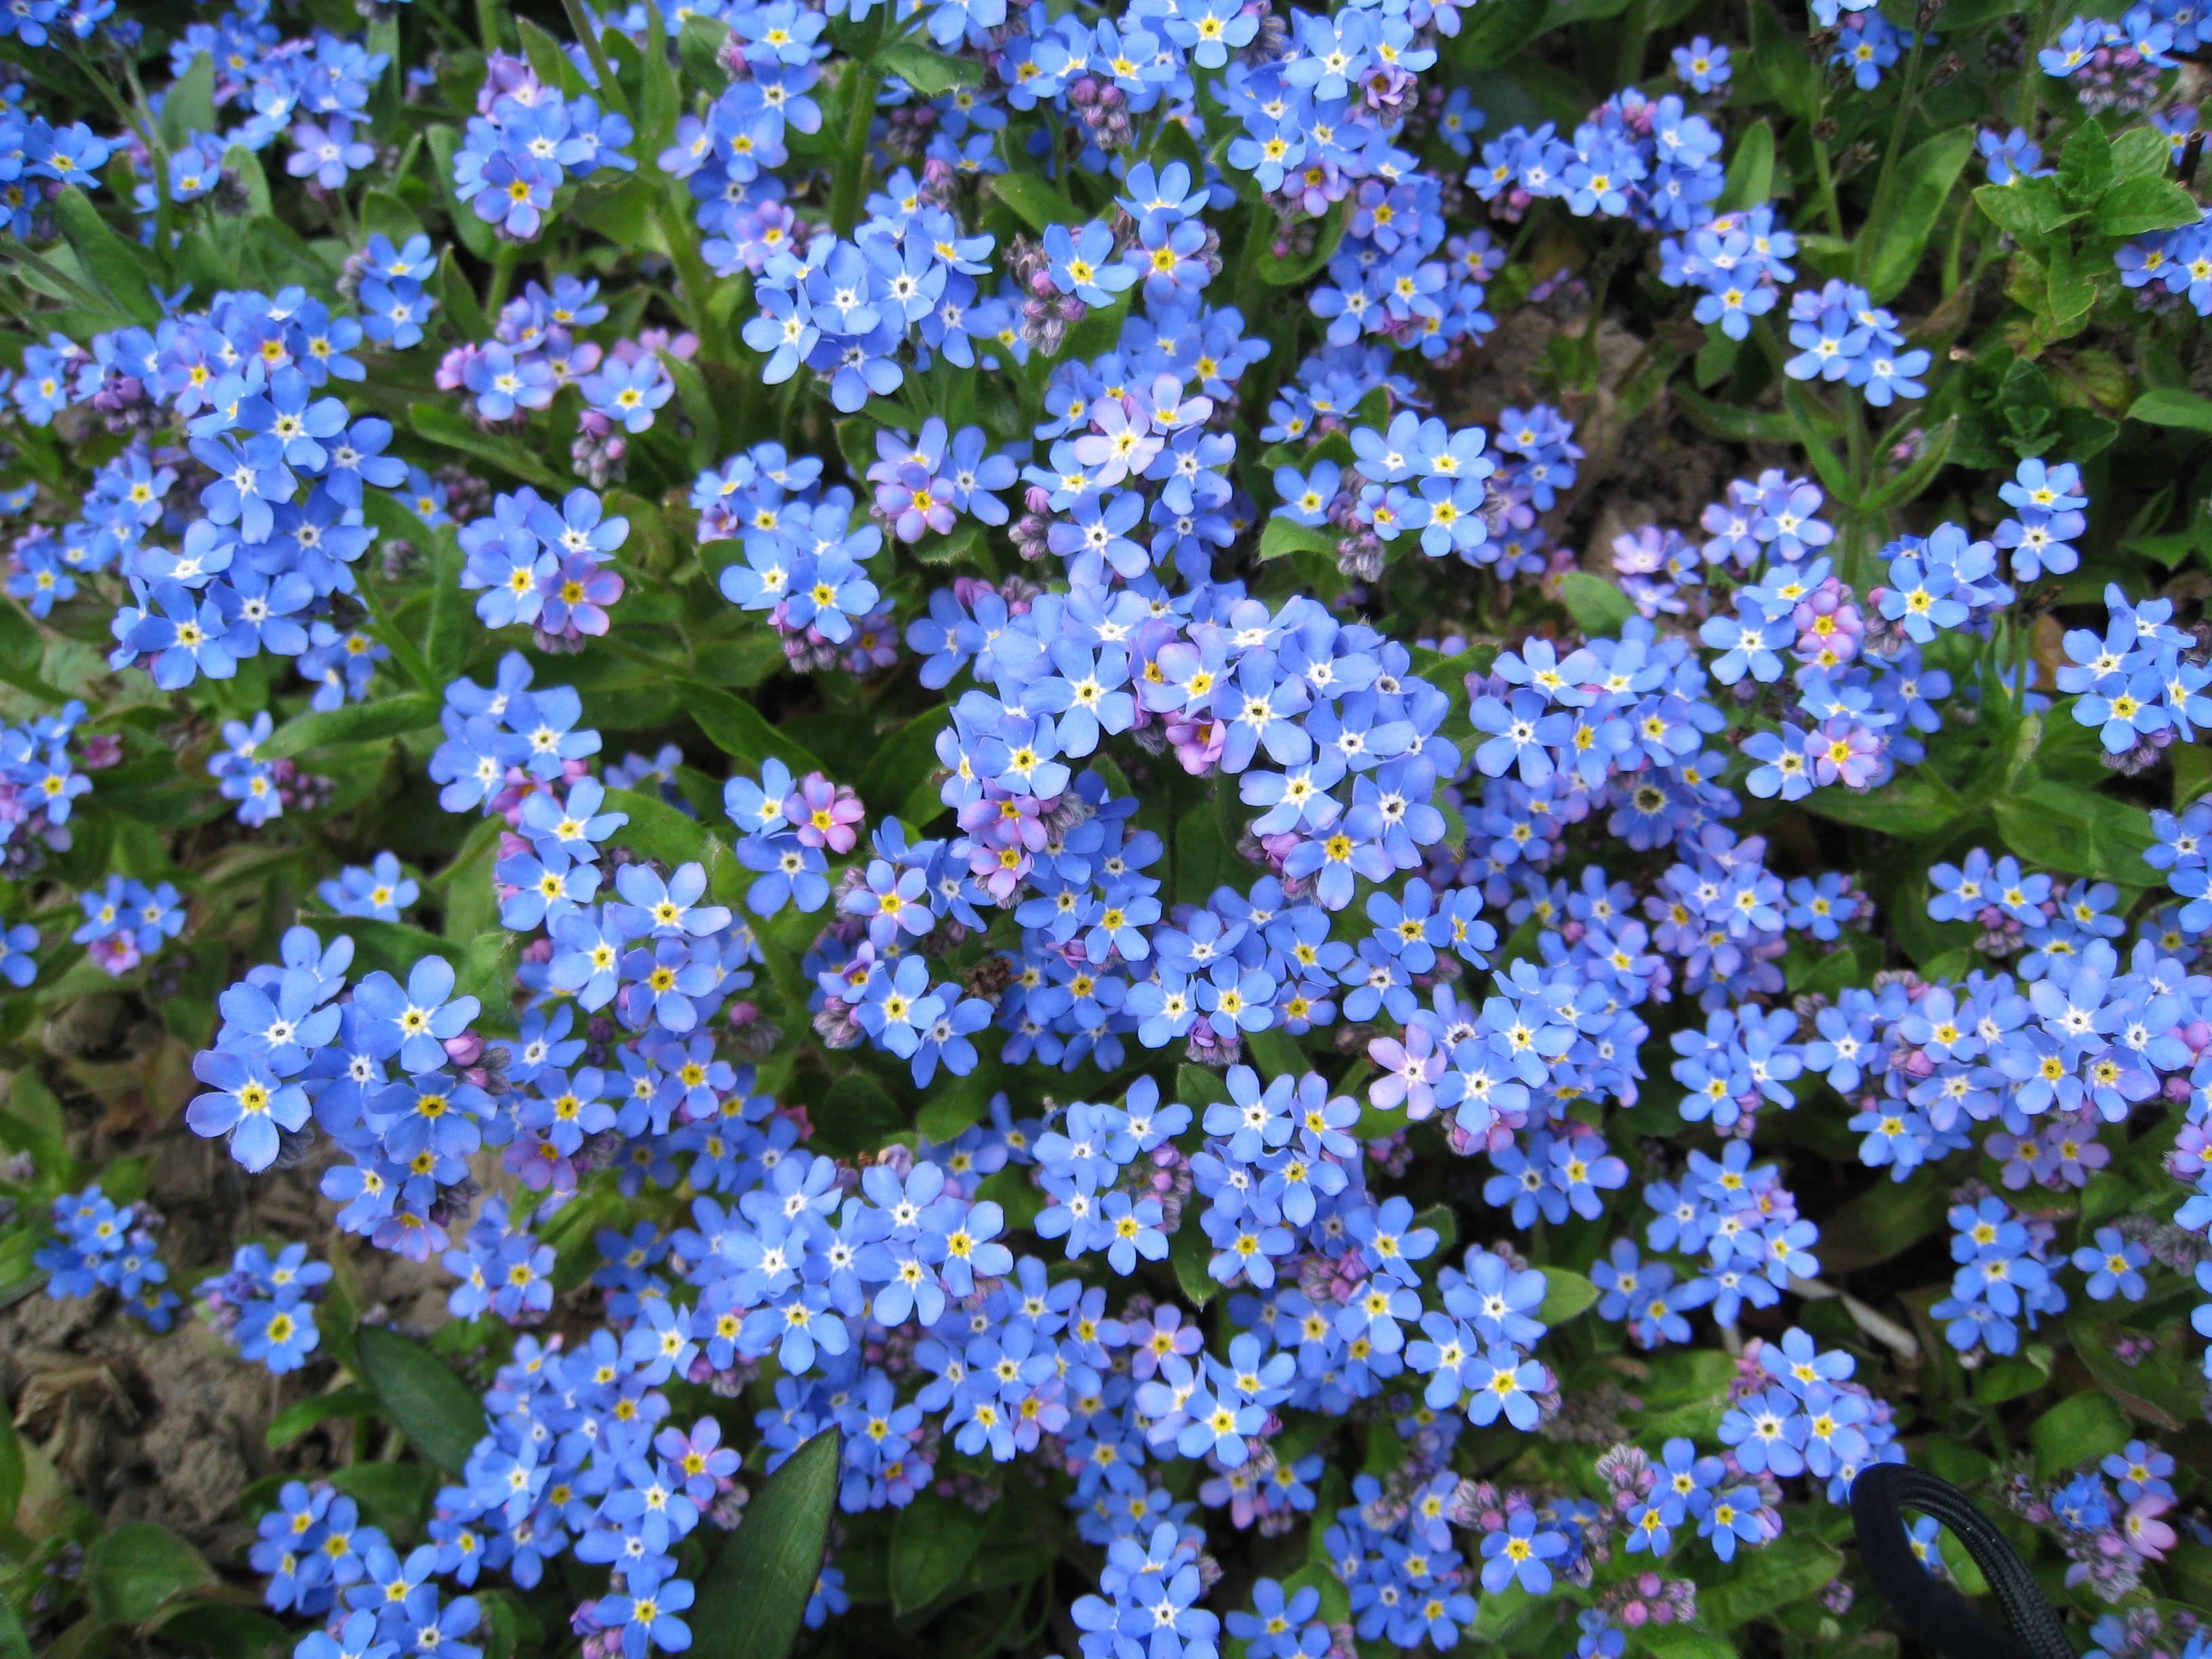 myosotis myosotis pinterest myosotis fleurs myosotis et fleurs bleues vivaces. Black Bedroom Furniture Sets. Home Design Ideas